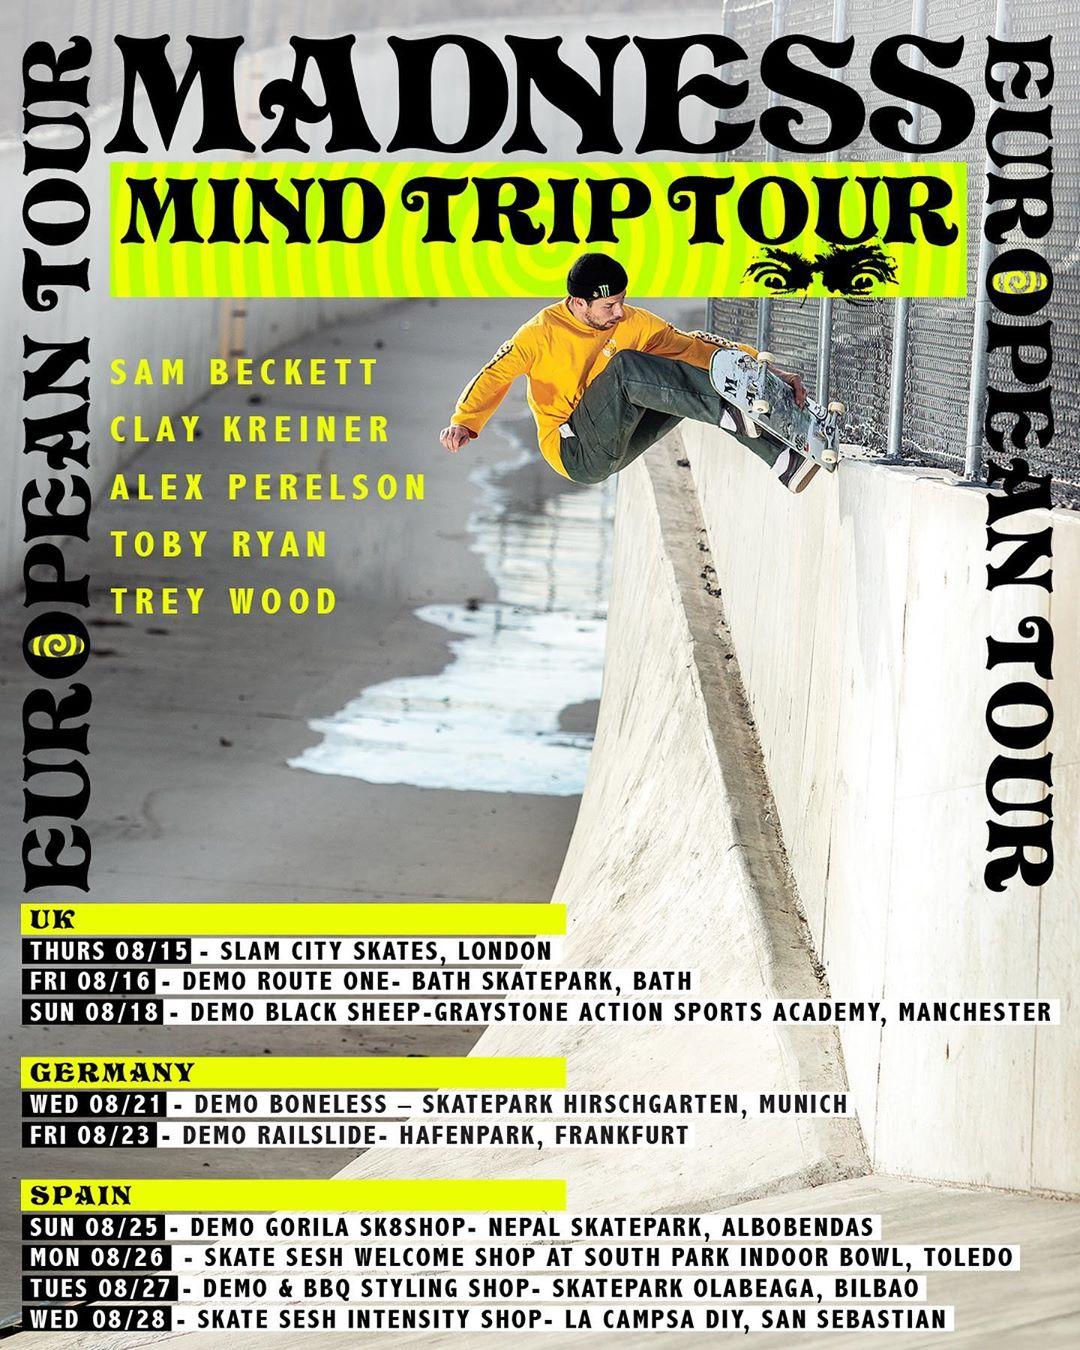 madness-mind-trip-euro-tour.jpg